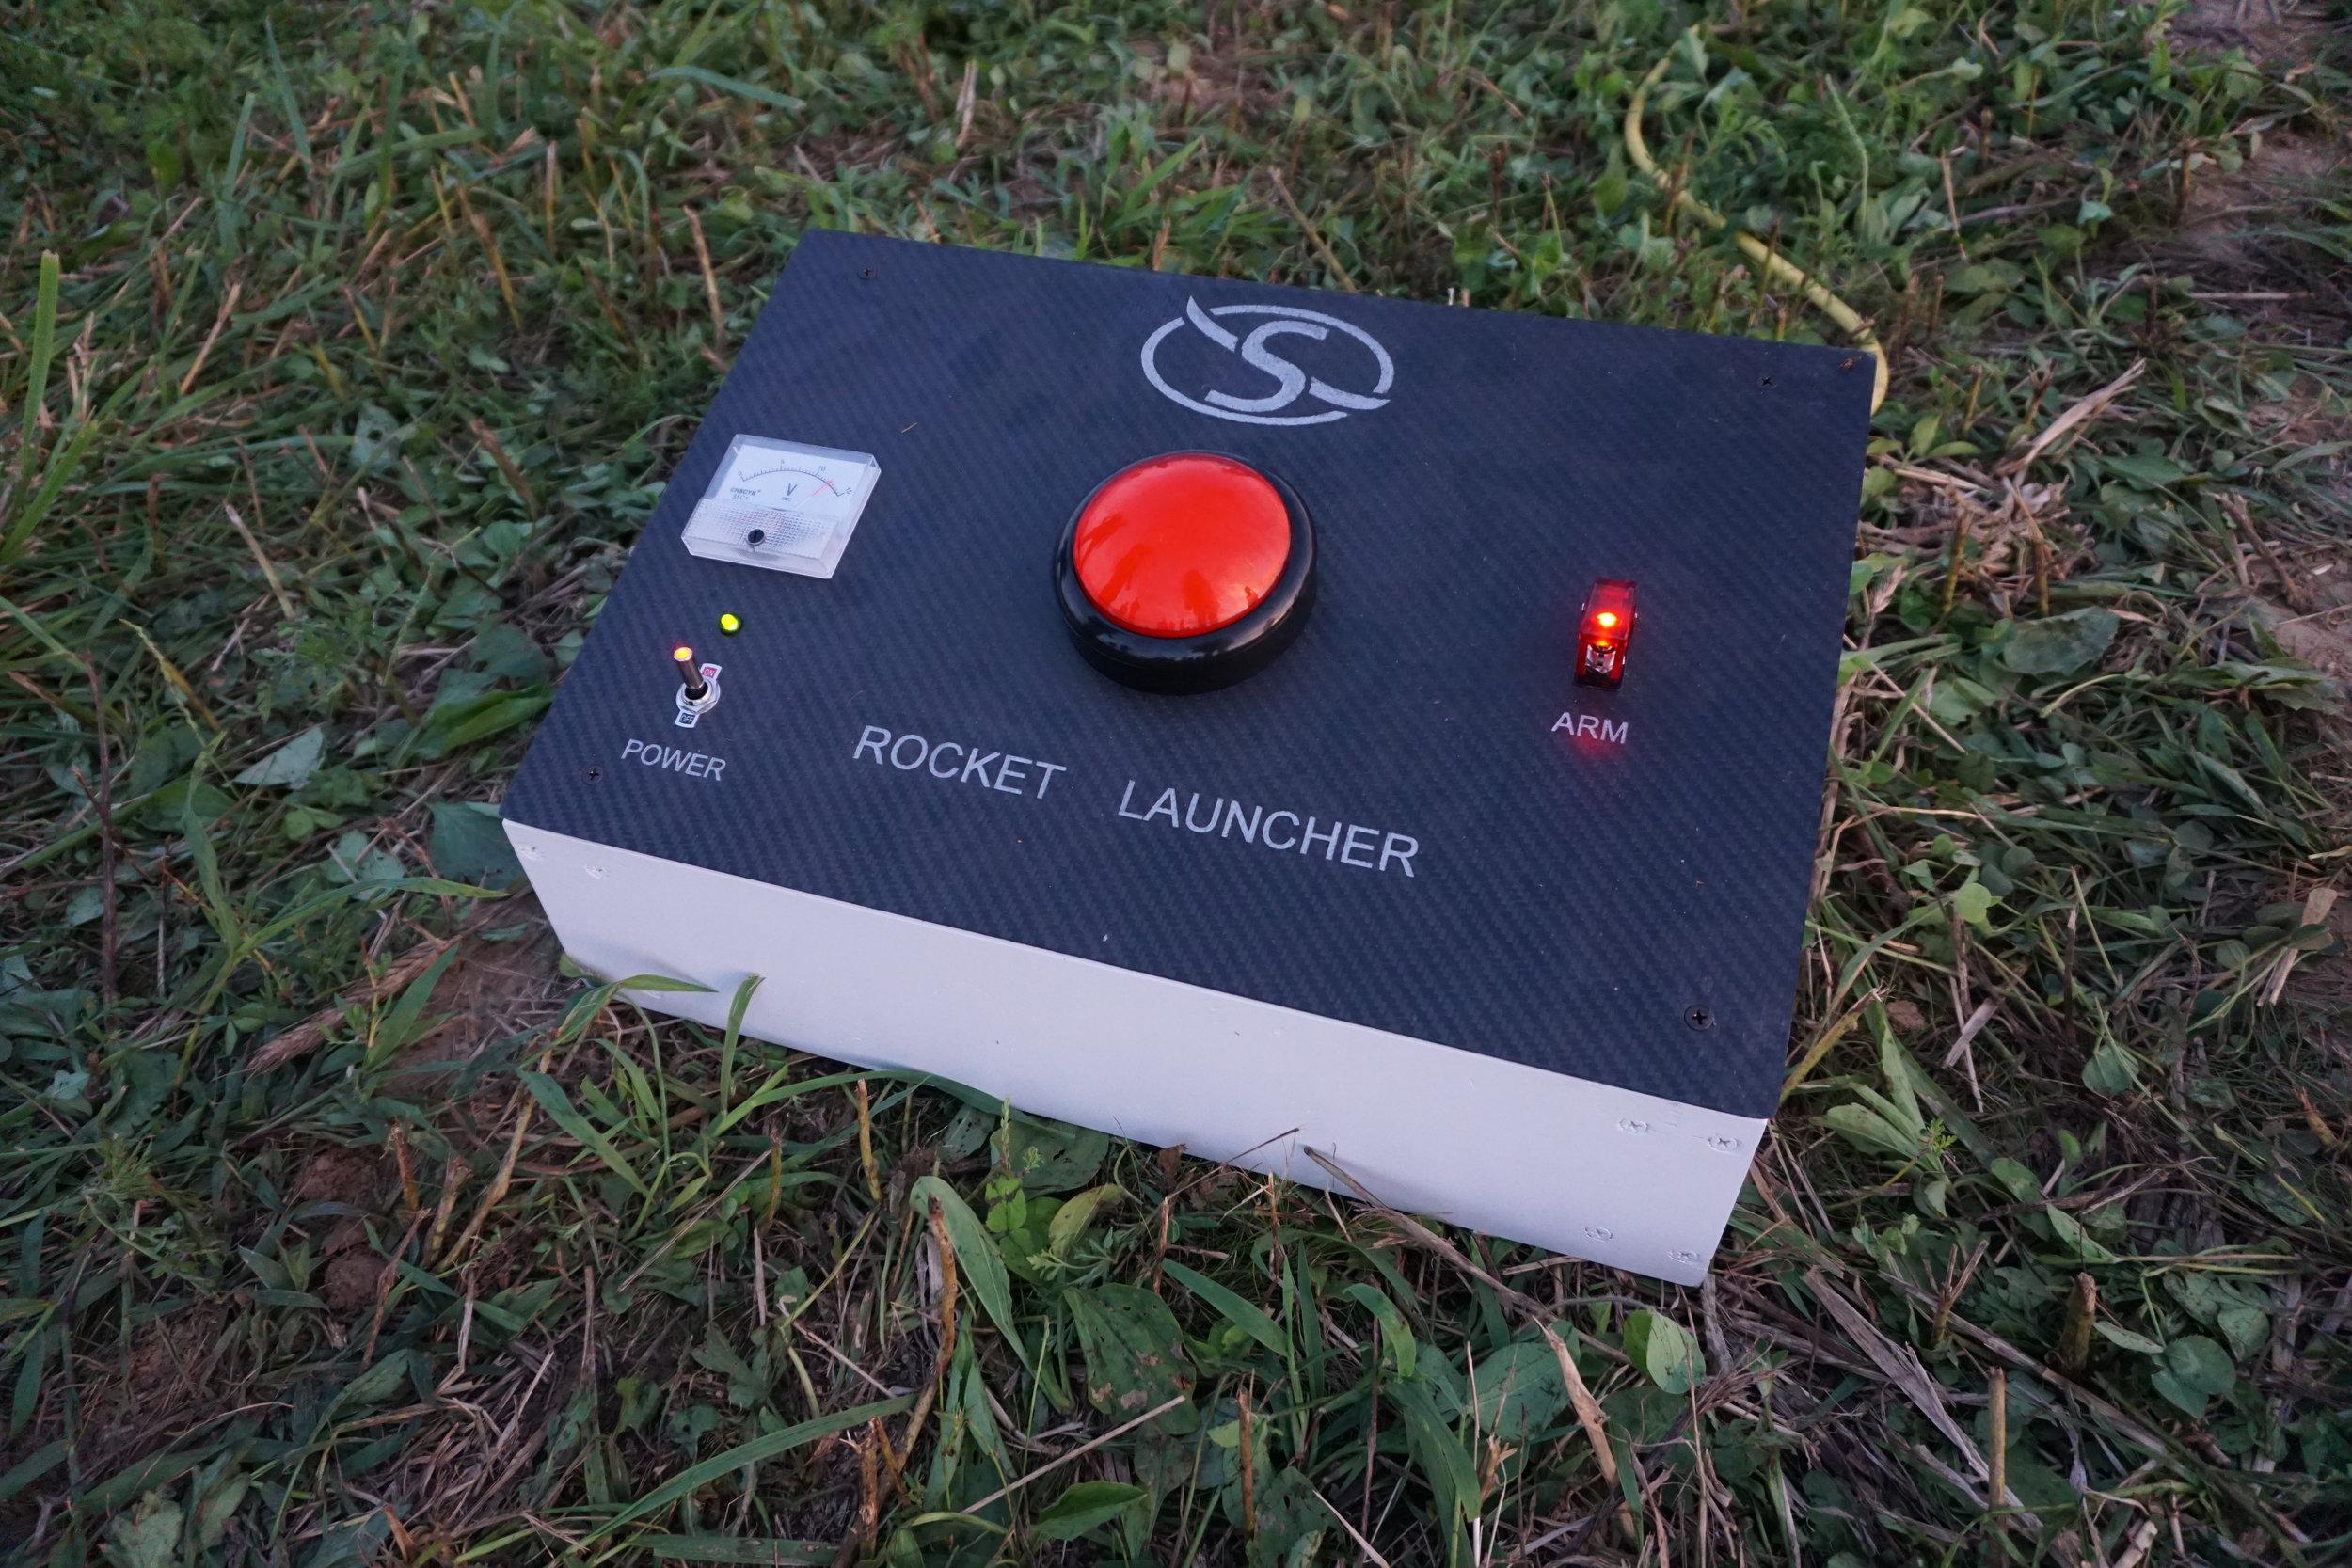 Rocket Launcher.JPG